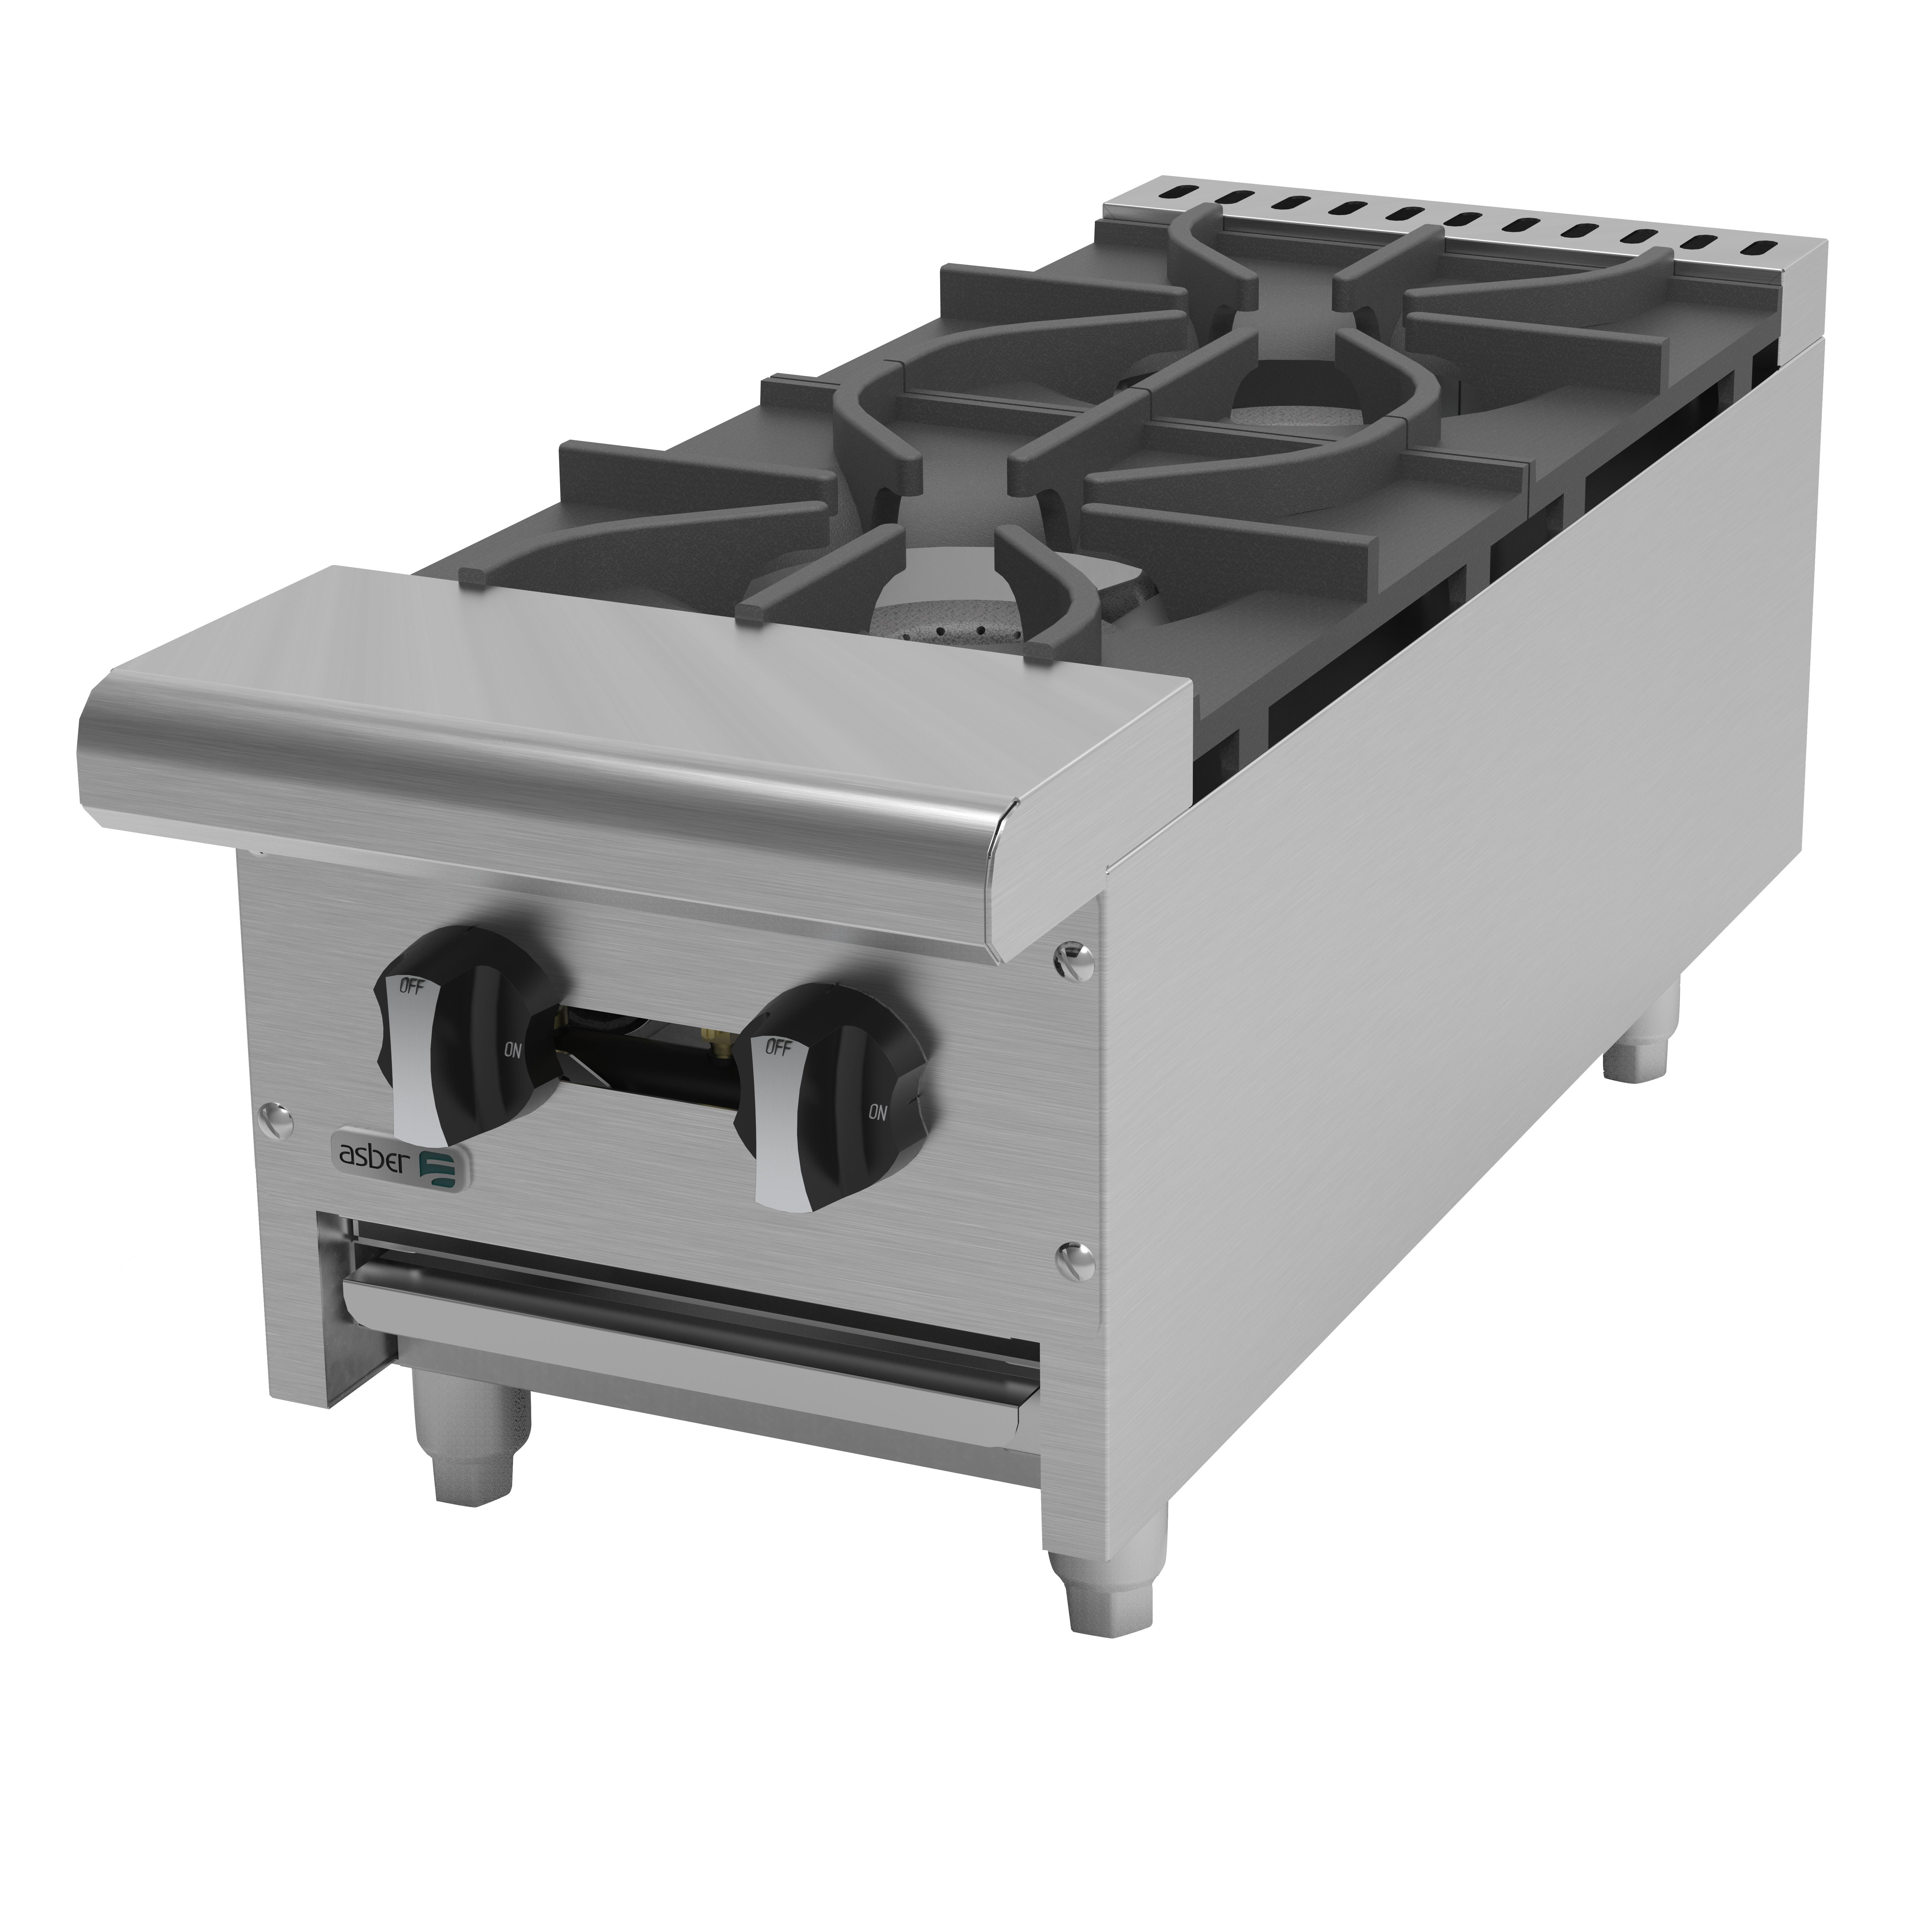 Asber AEHP-2-12 hotplate, countertop, gas